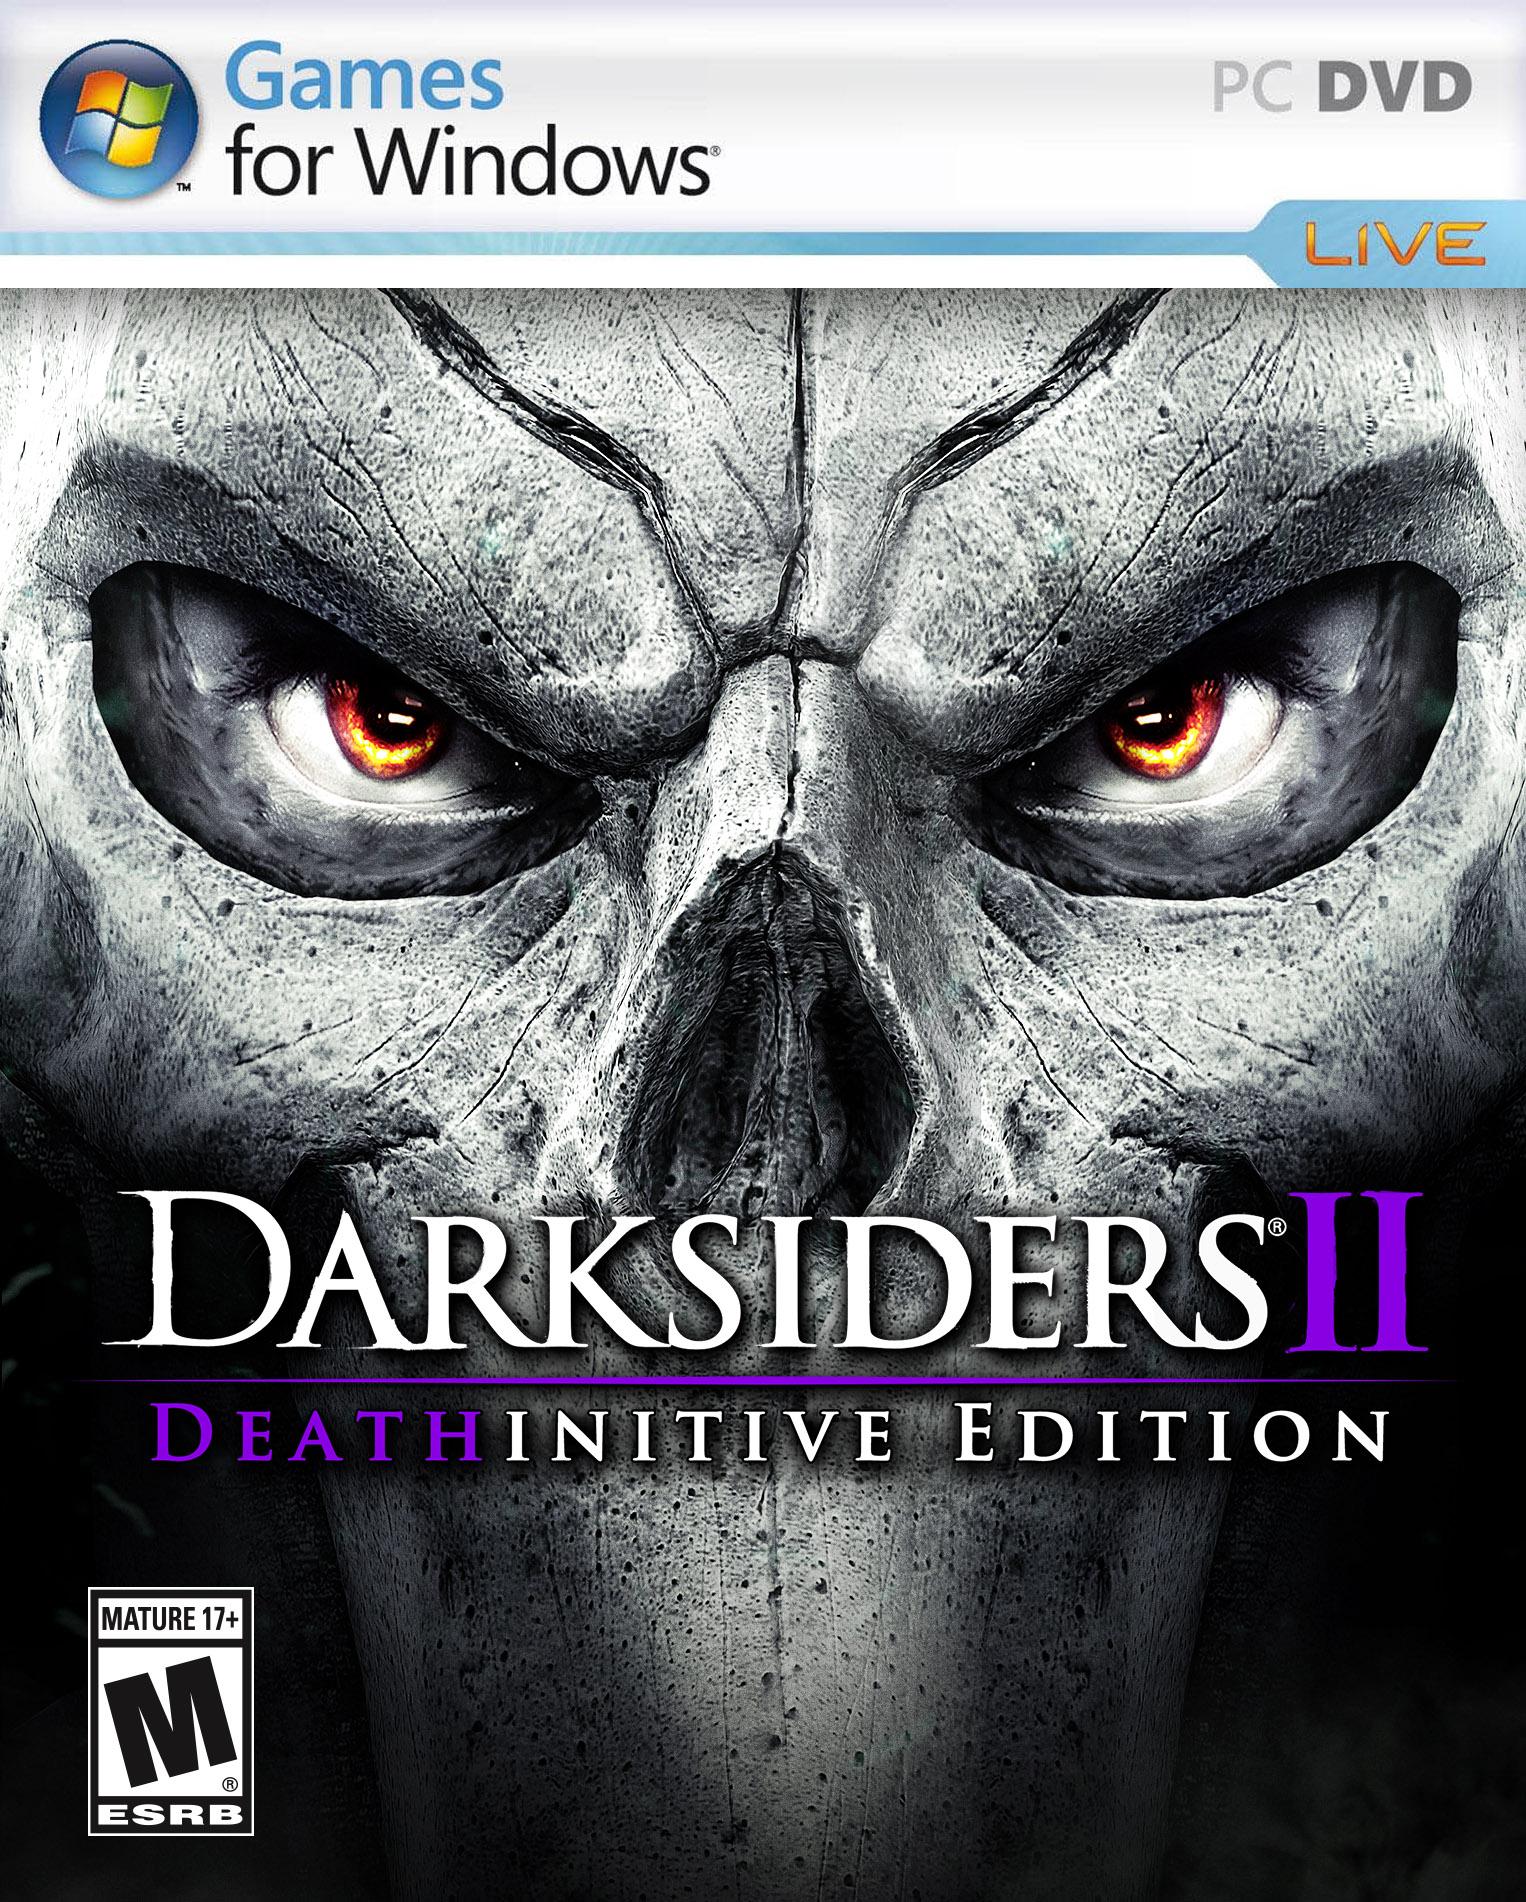 Darksiders II Deathinitive Edition (2015) RePack